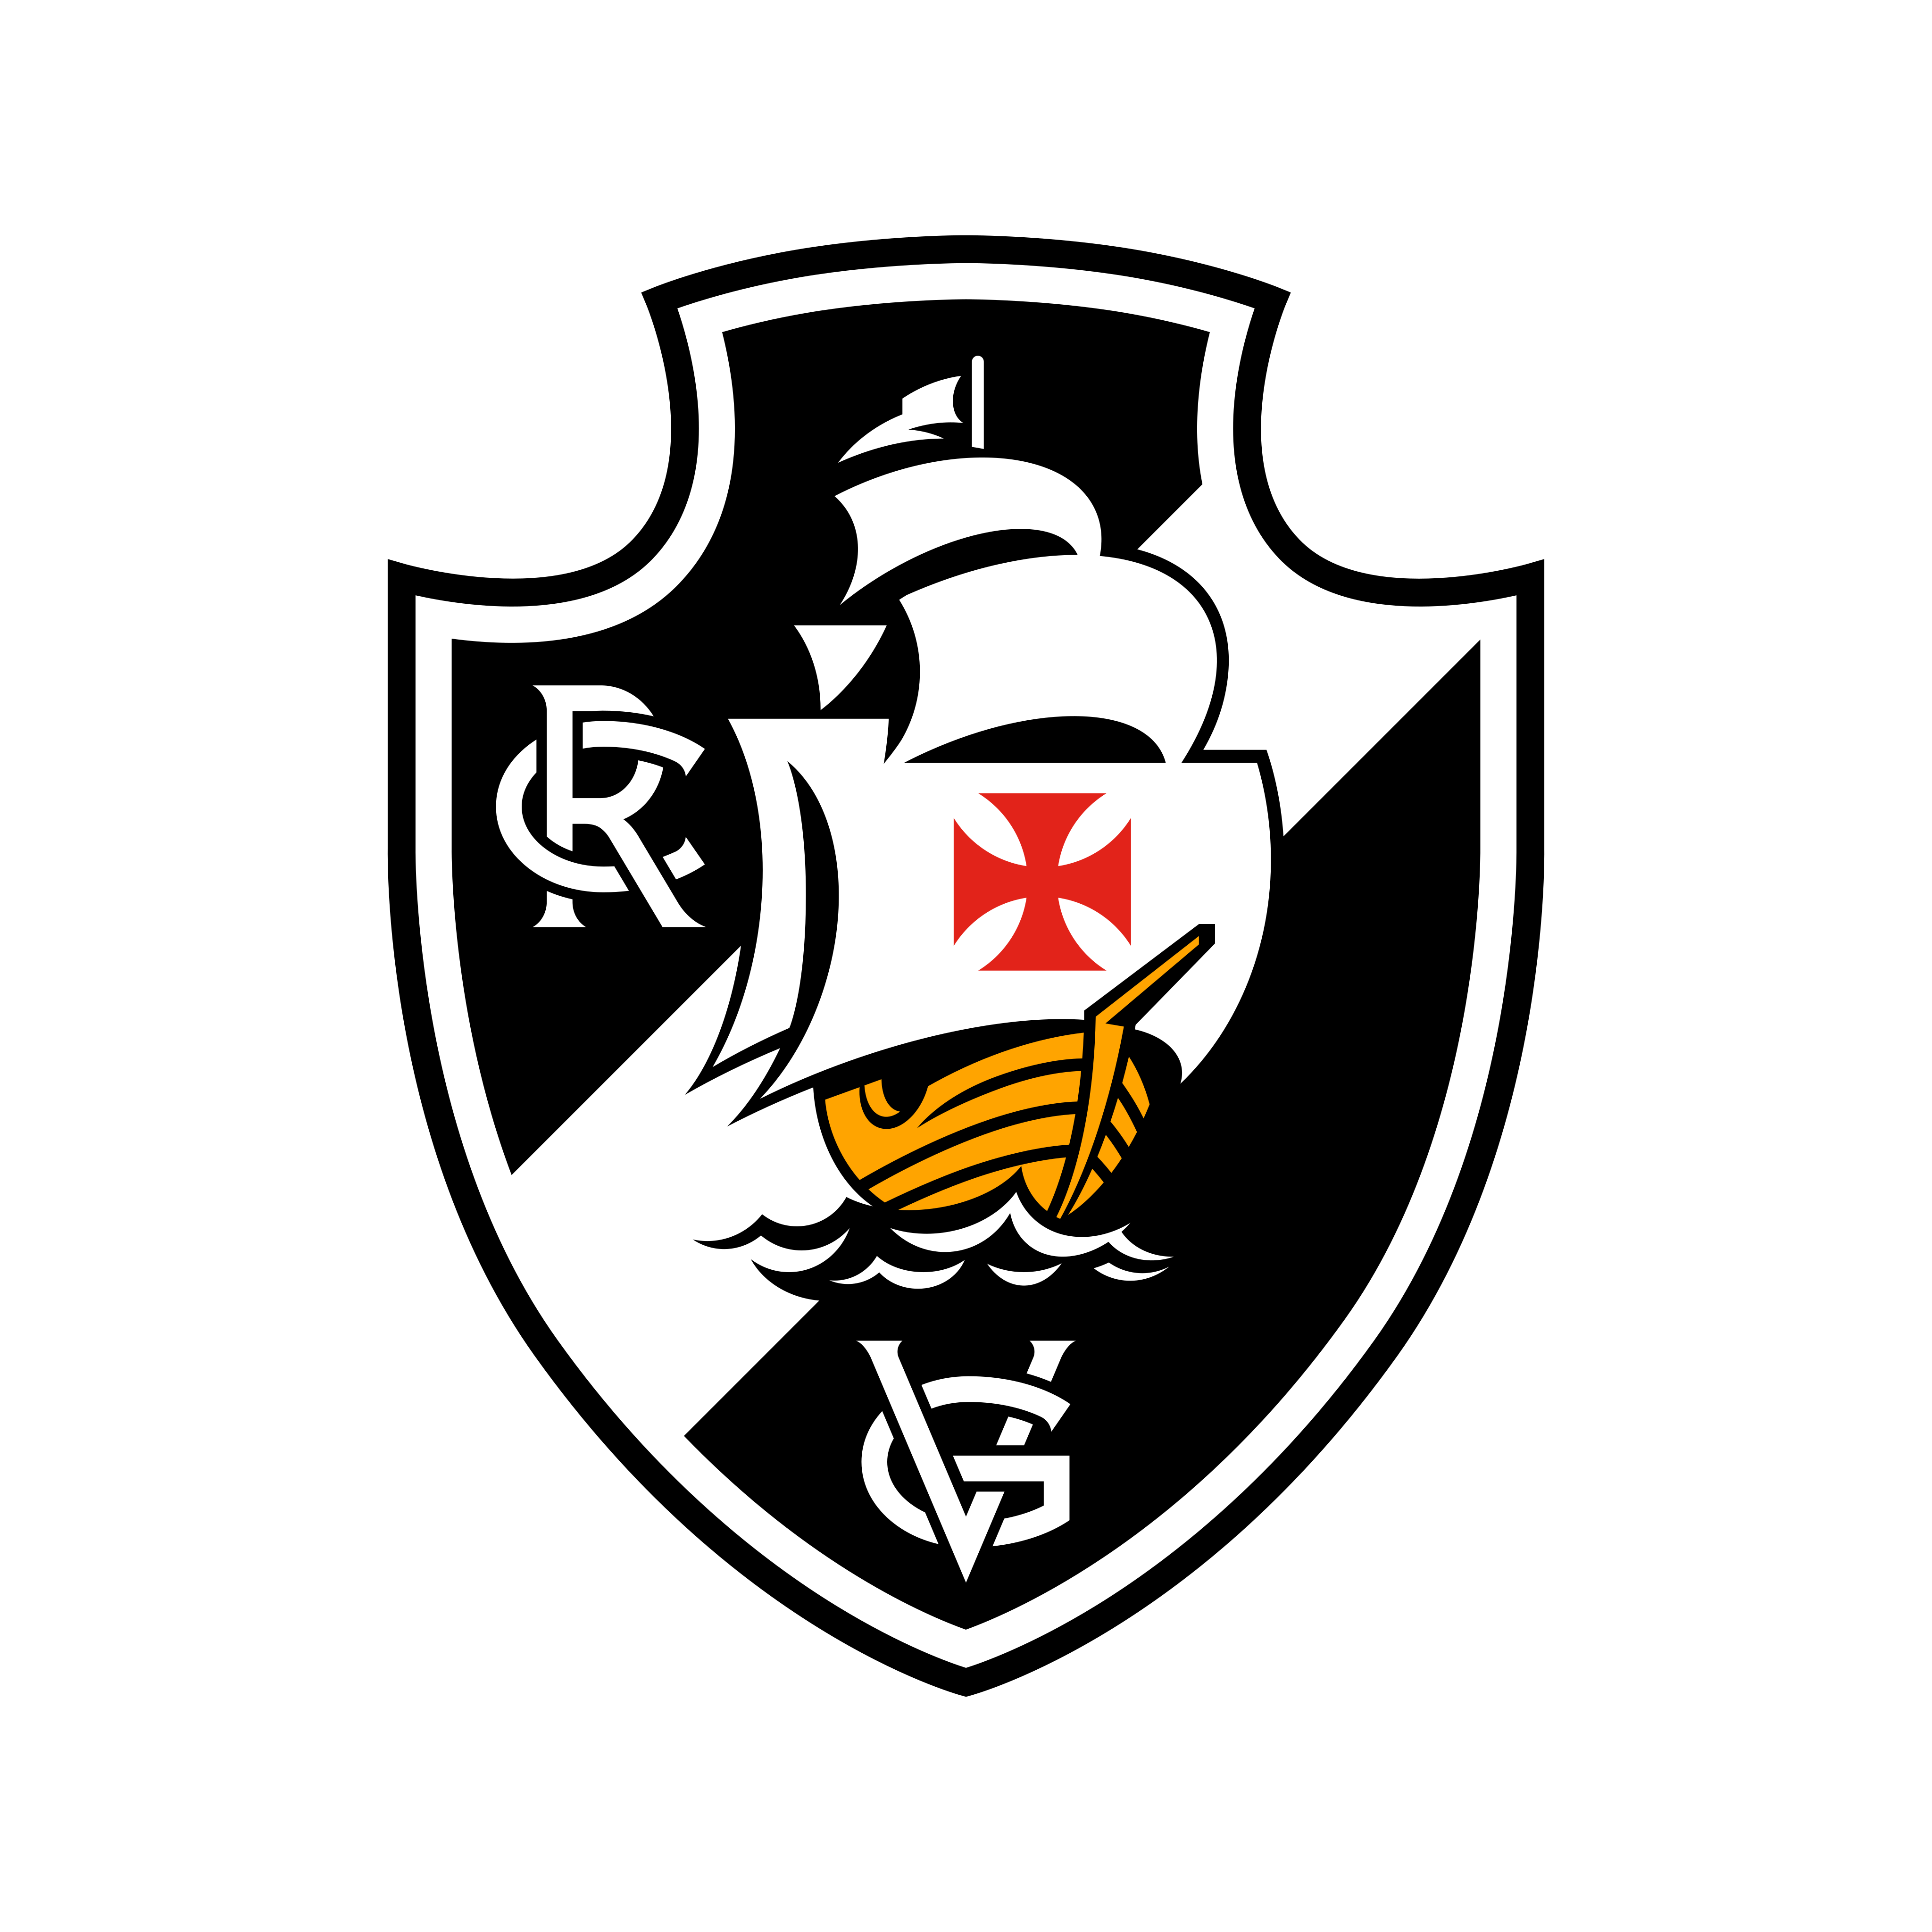 vasco logo 0 - Vasco da Gama Logo - Escudo